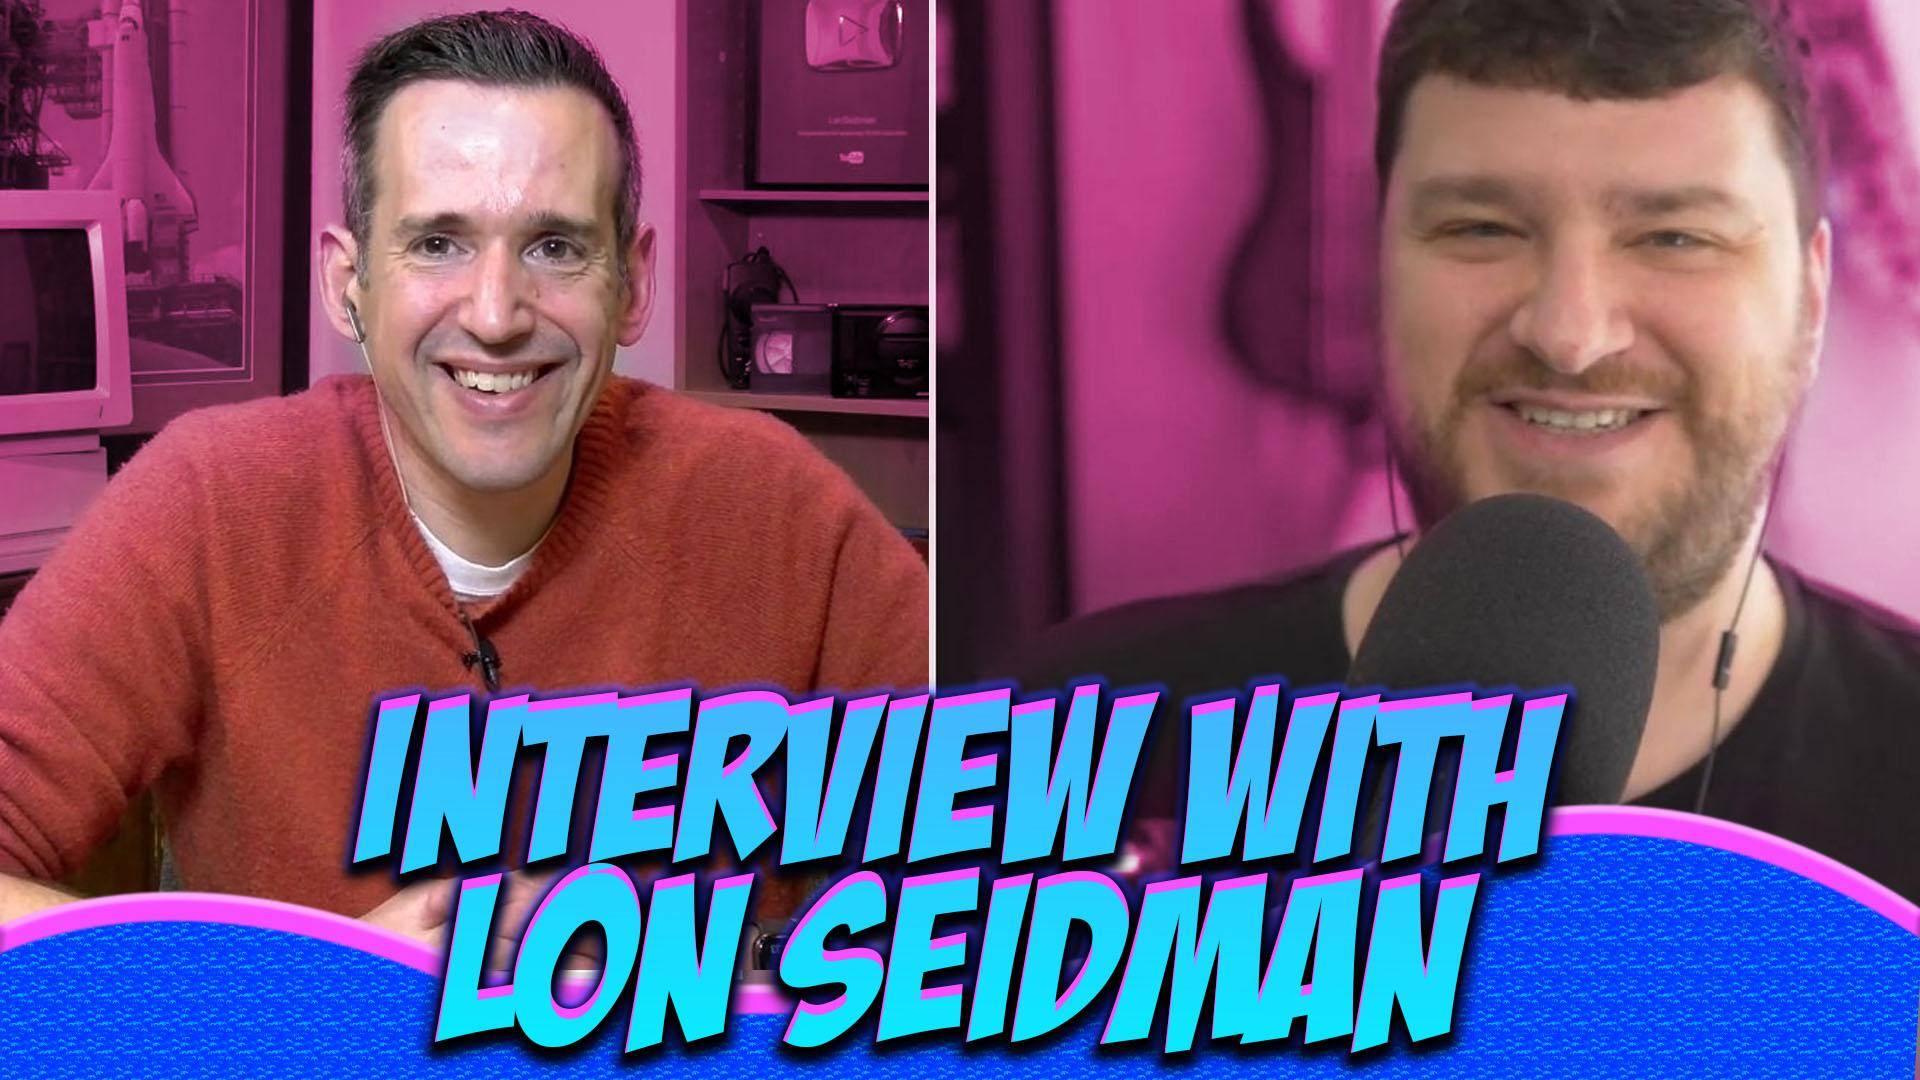 Interview with Lon Seidman